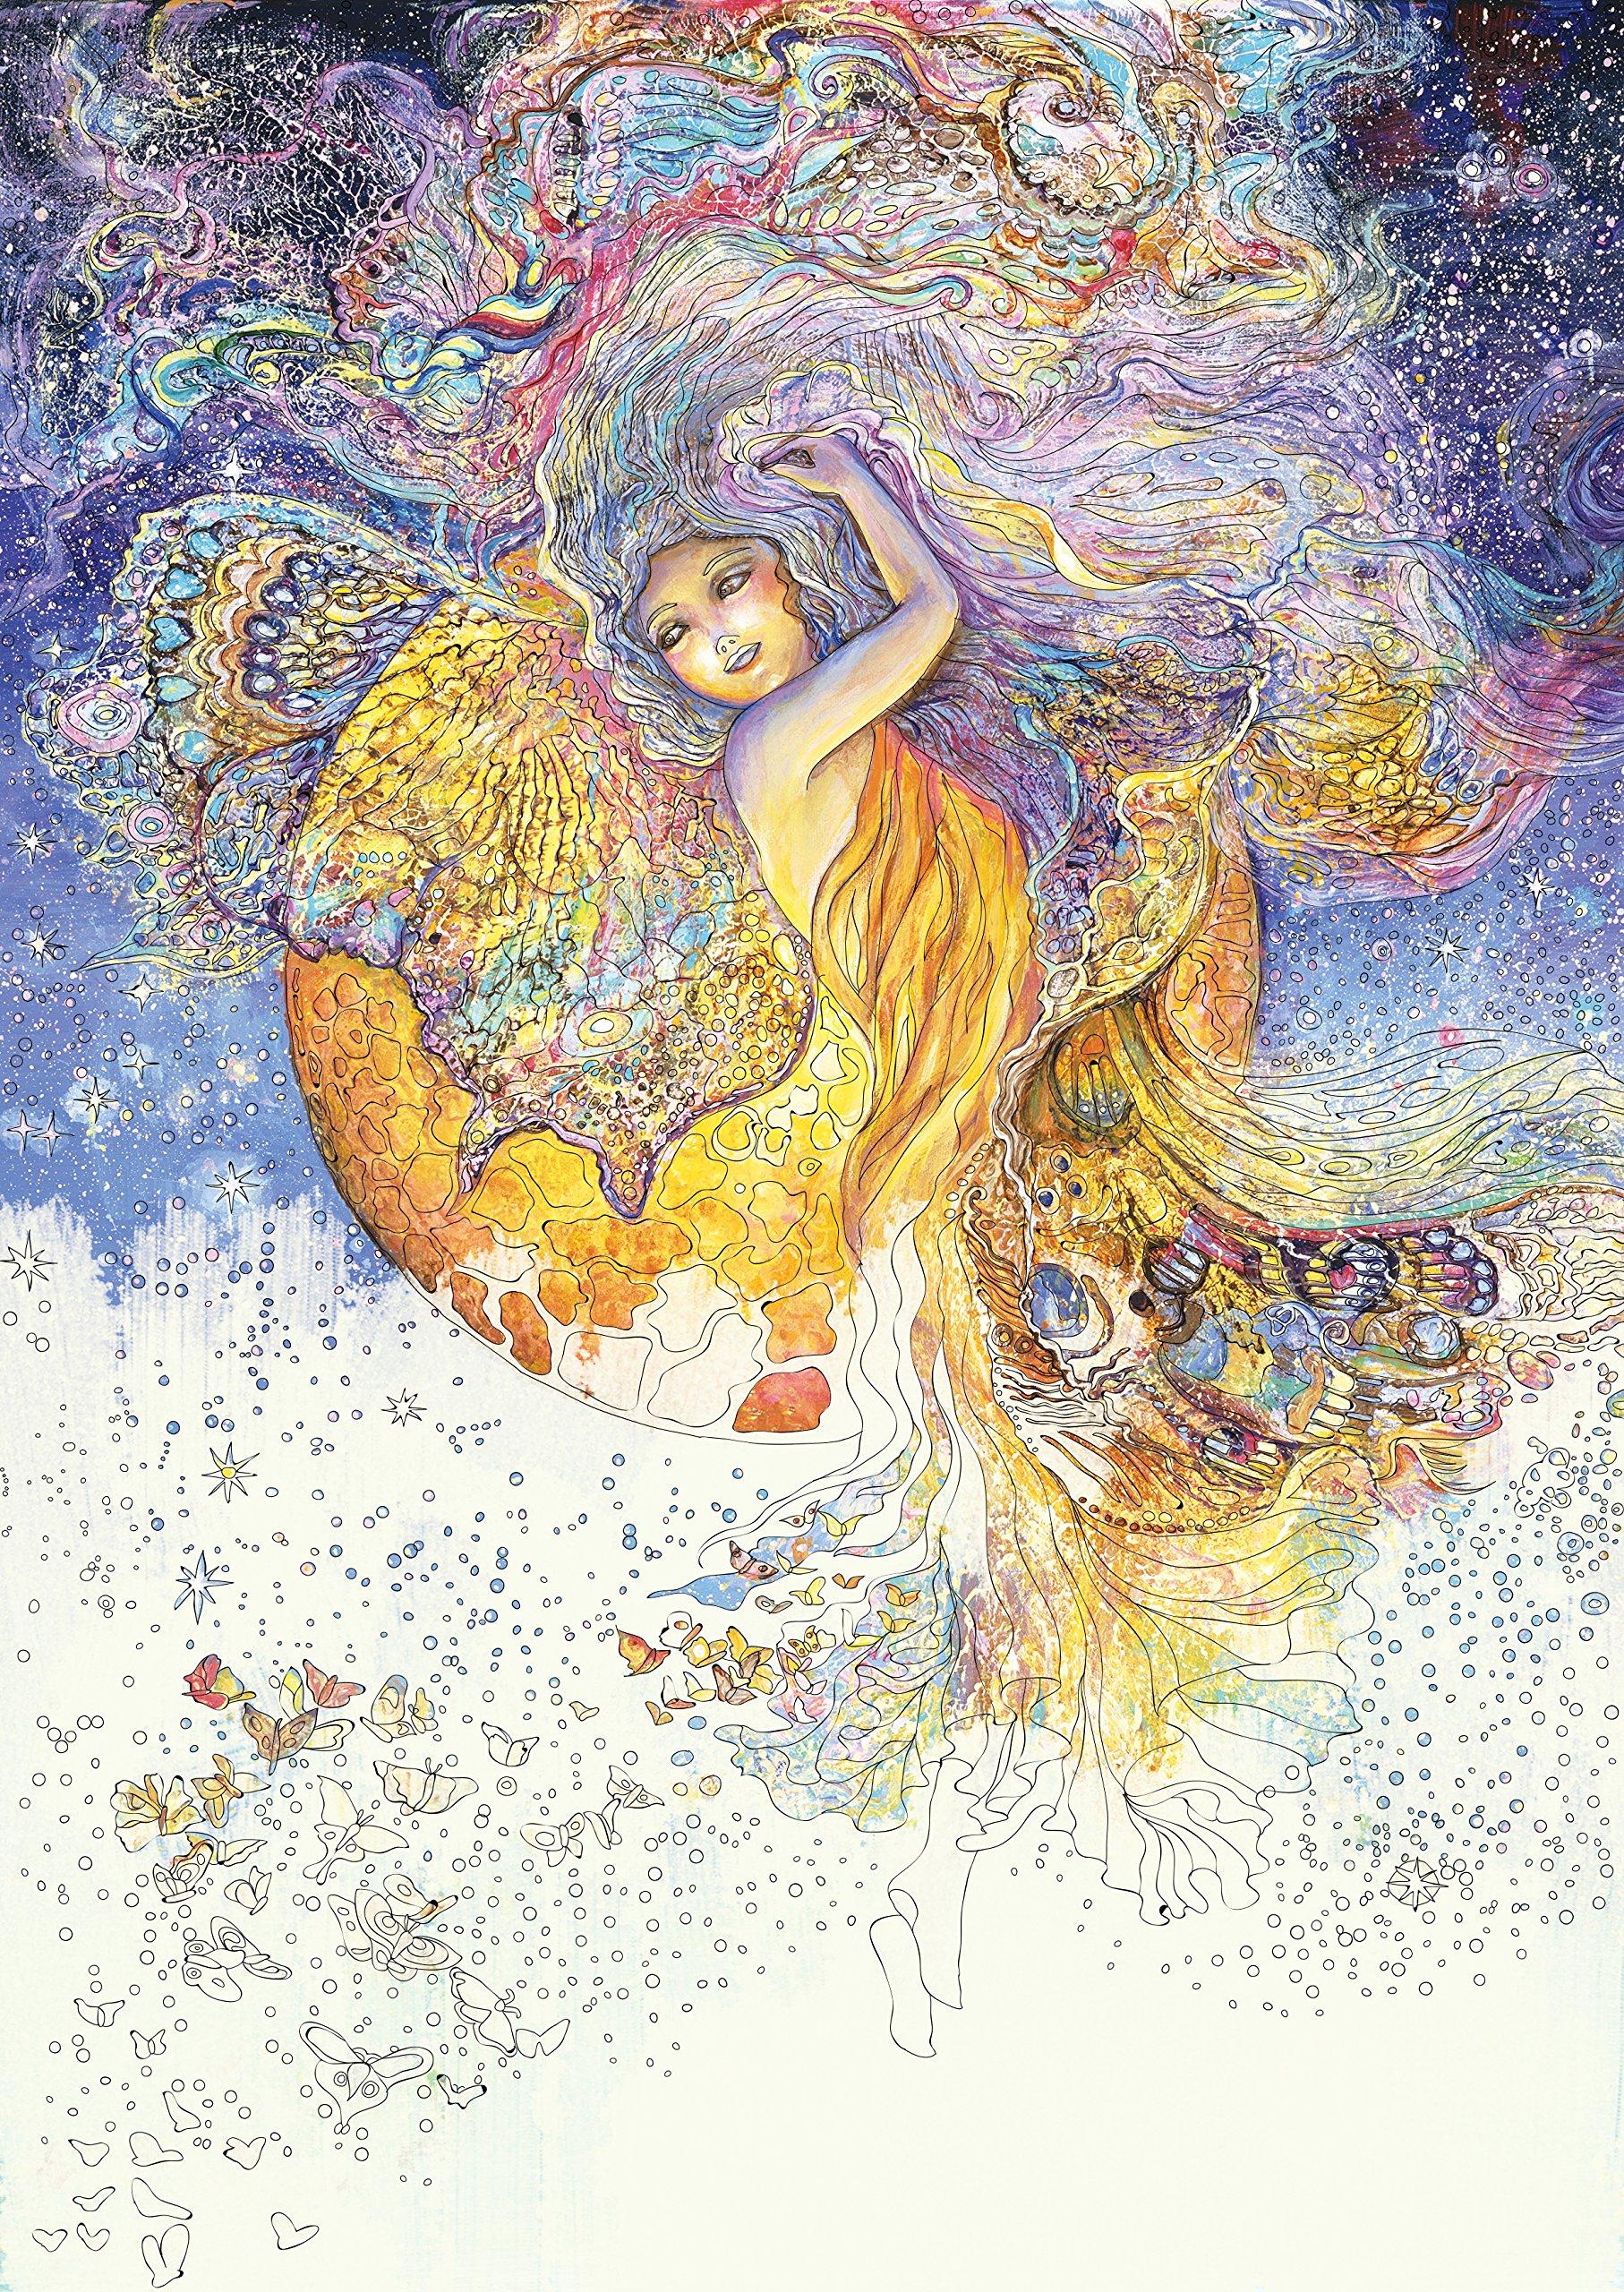 Amazon.com: Enchnated Fairies Coloring Book (9781925538205 ...